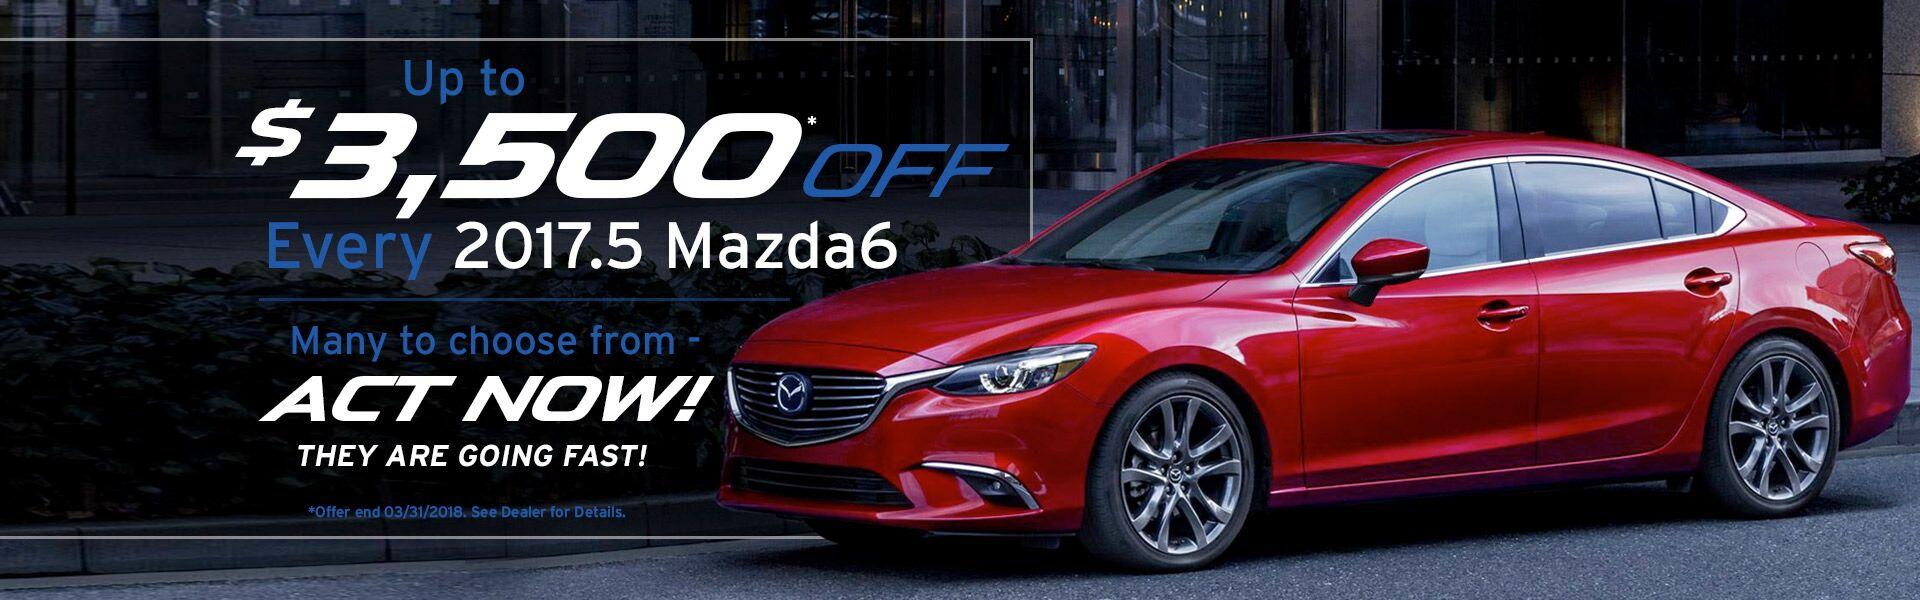 New Used Car Dealership Near Garland TX Mazda Of Mesquite - Fast car 361